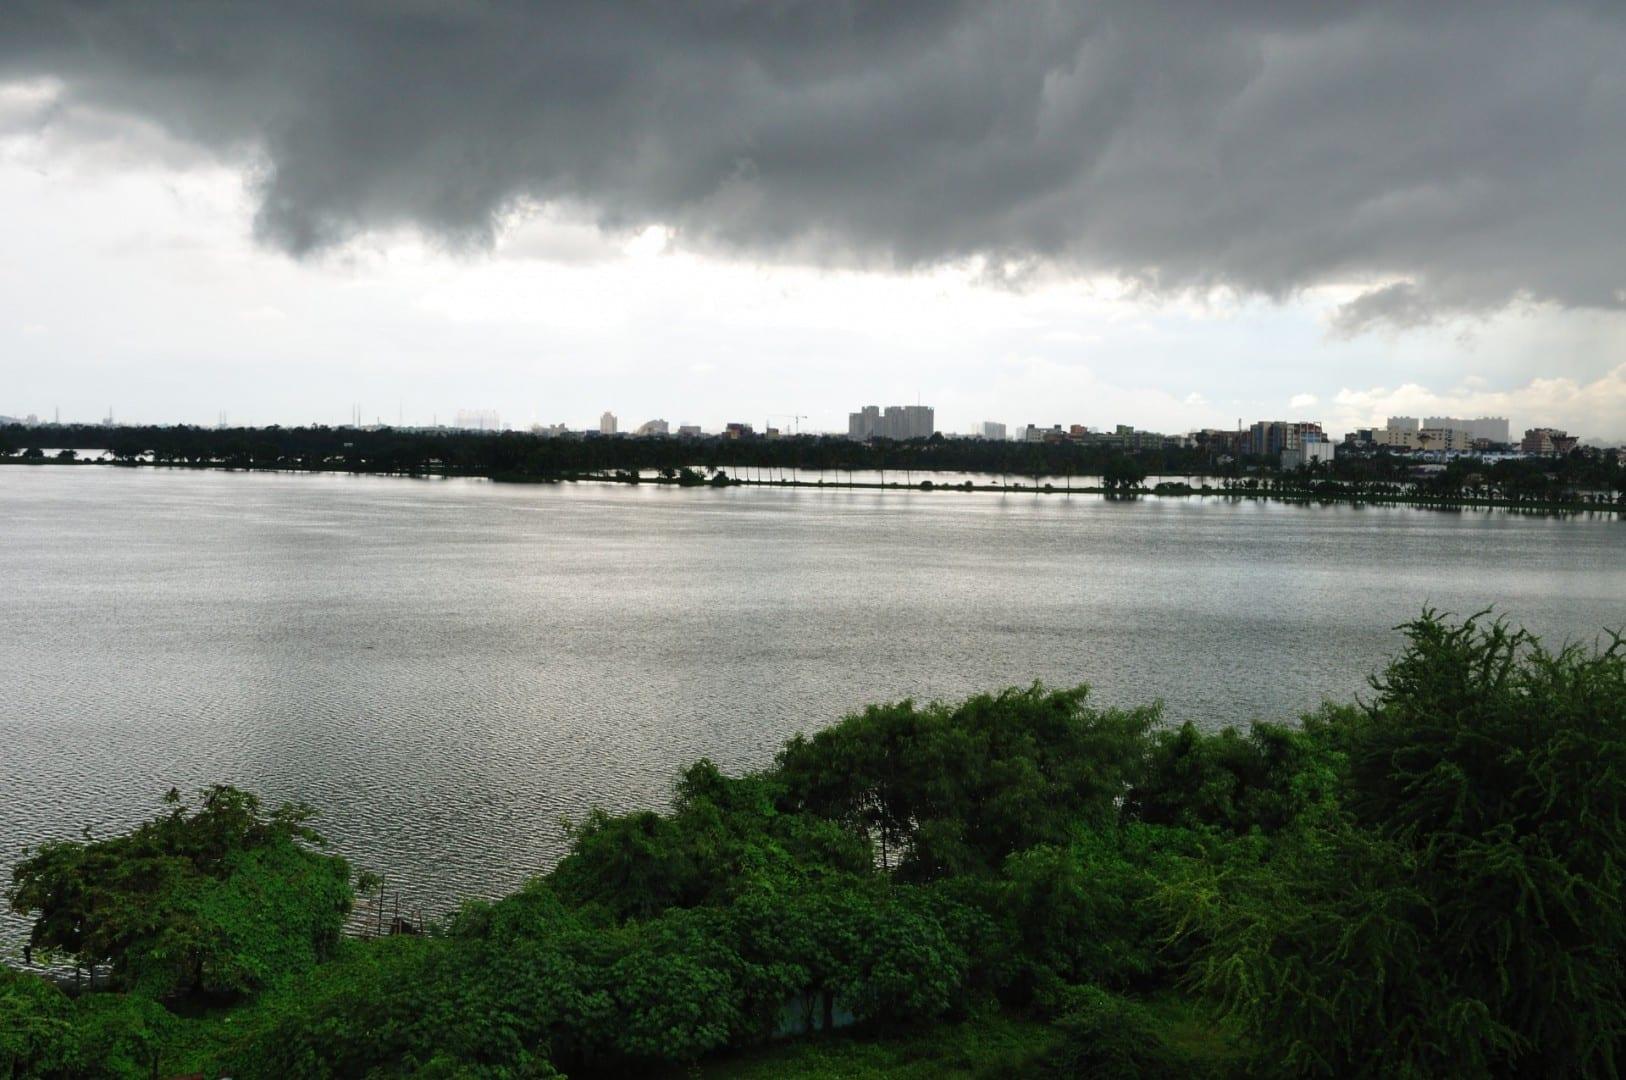 Las nubes del monzón sobre Calcuta. Calcuta India